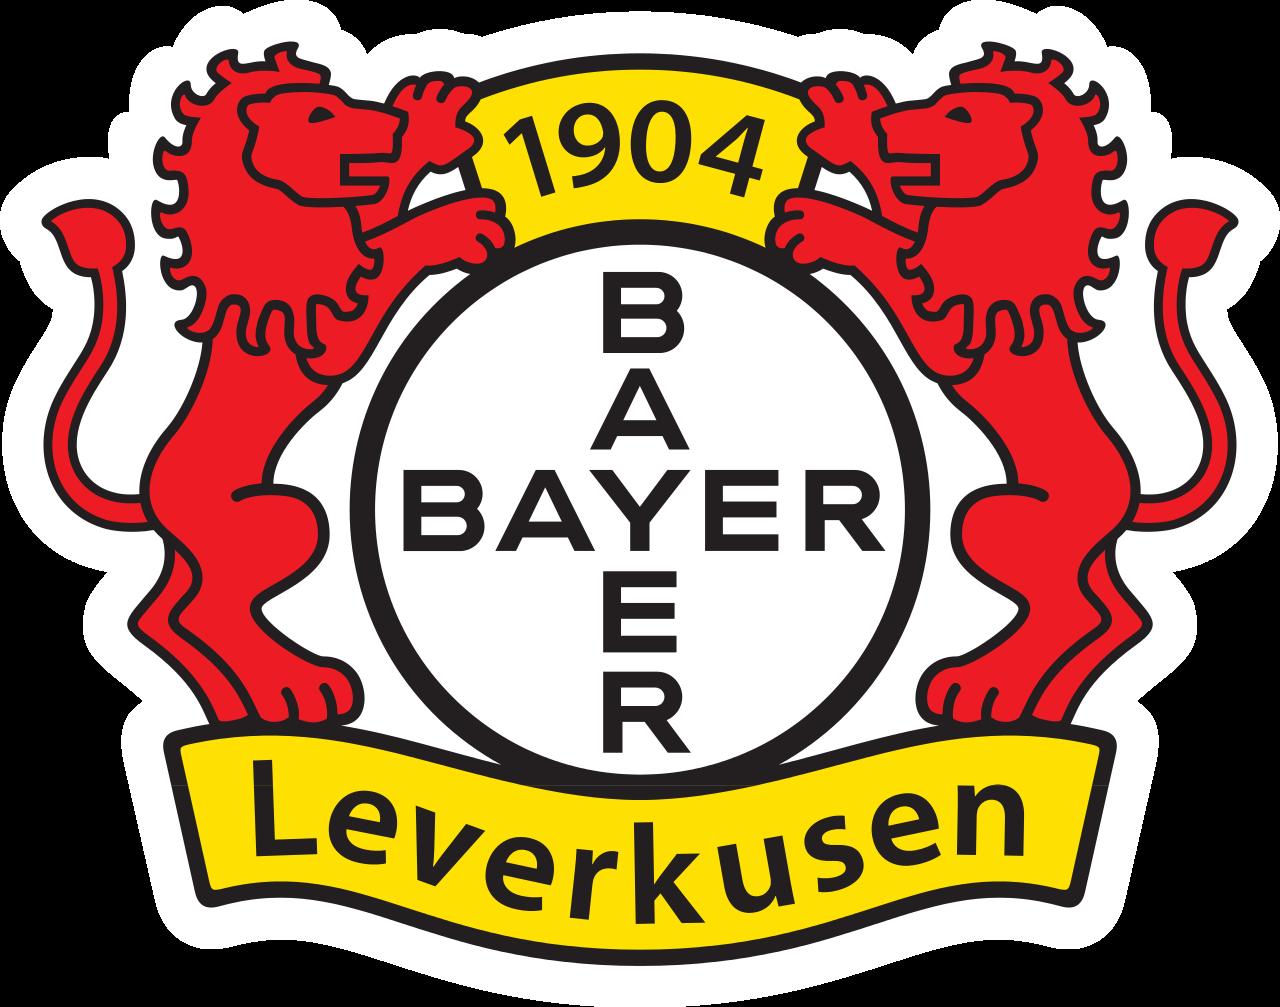 Terza Maglia Bayer 29 LeverkusenKevin Volland